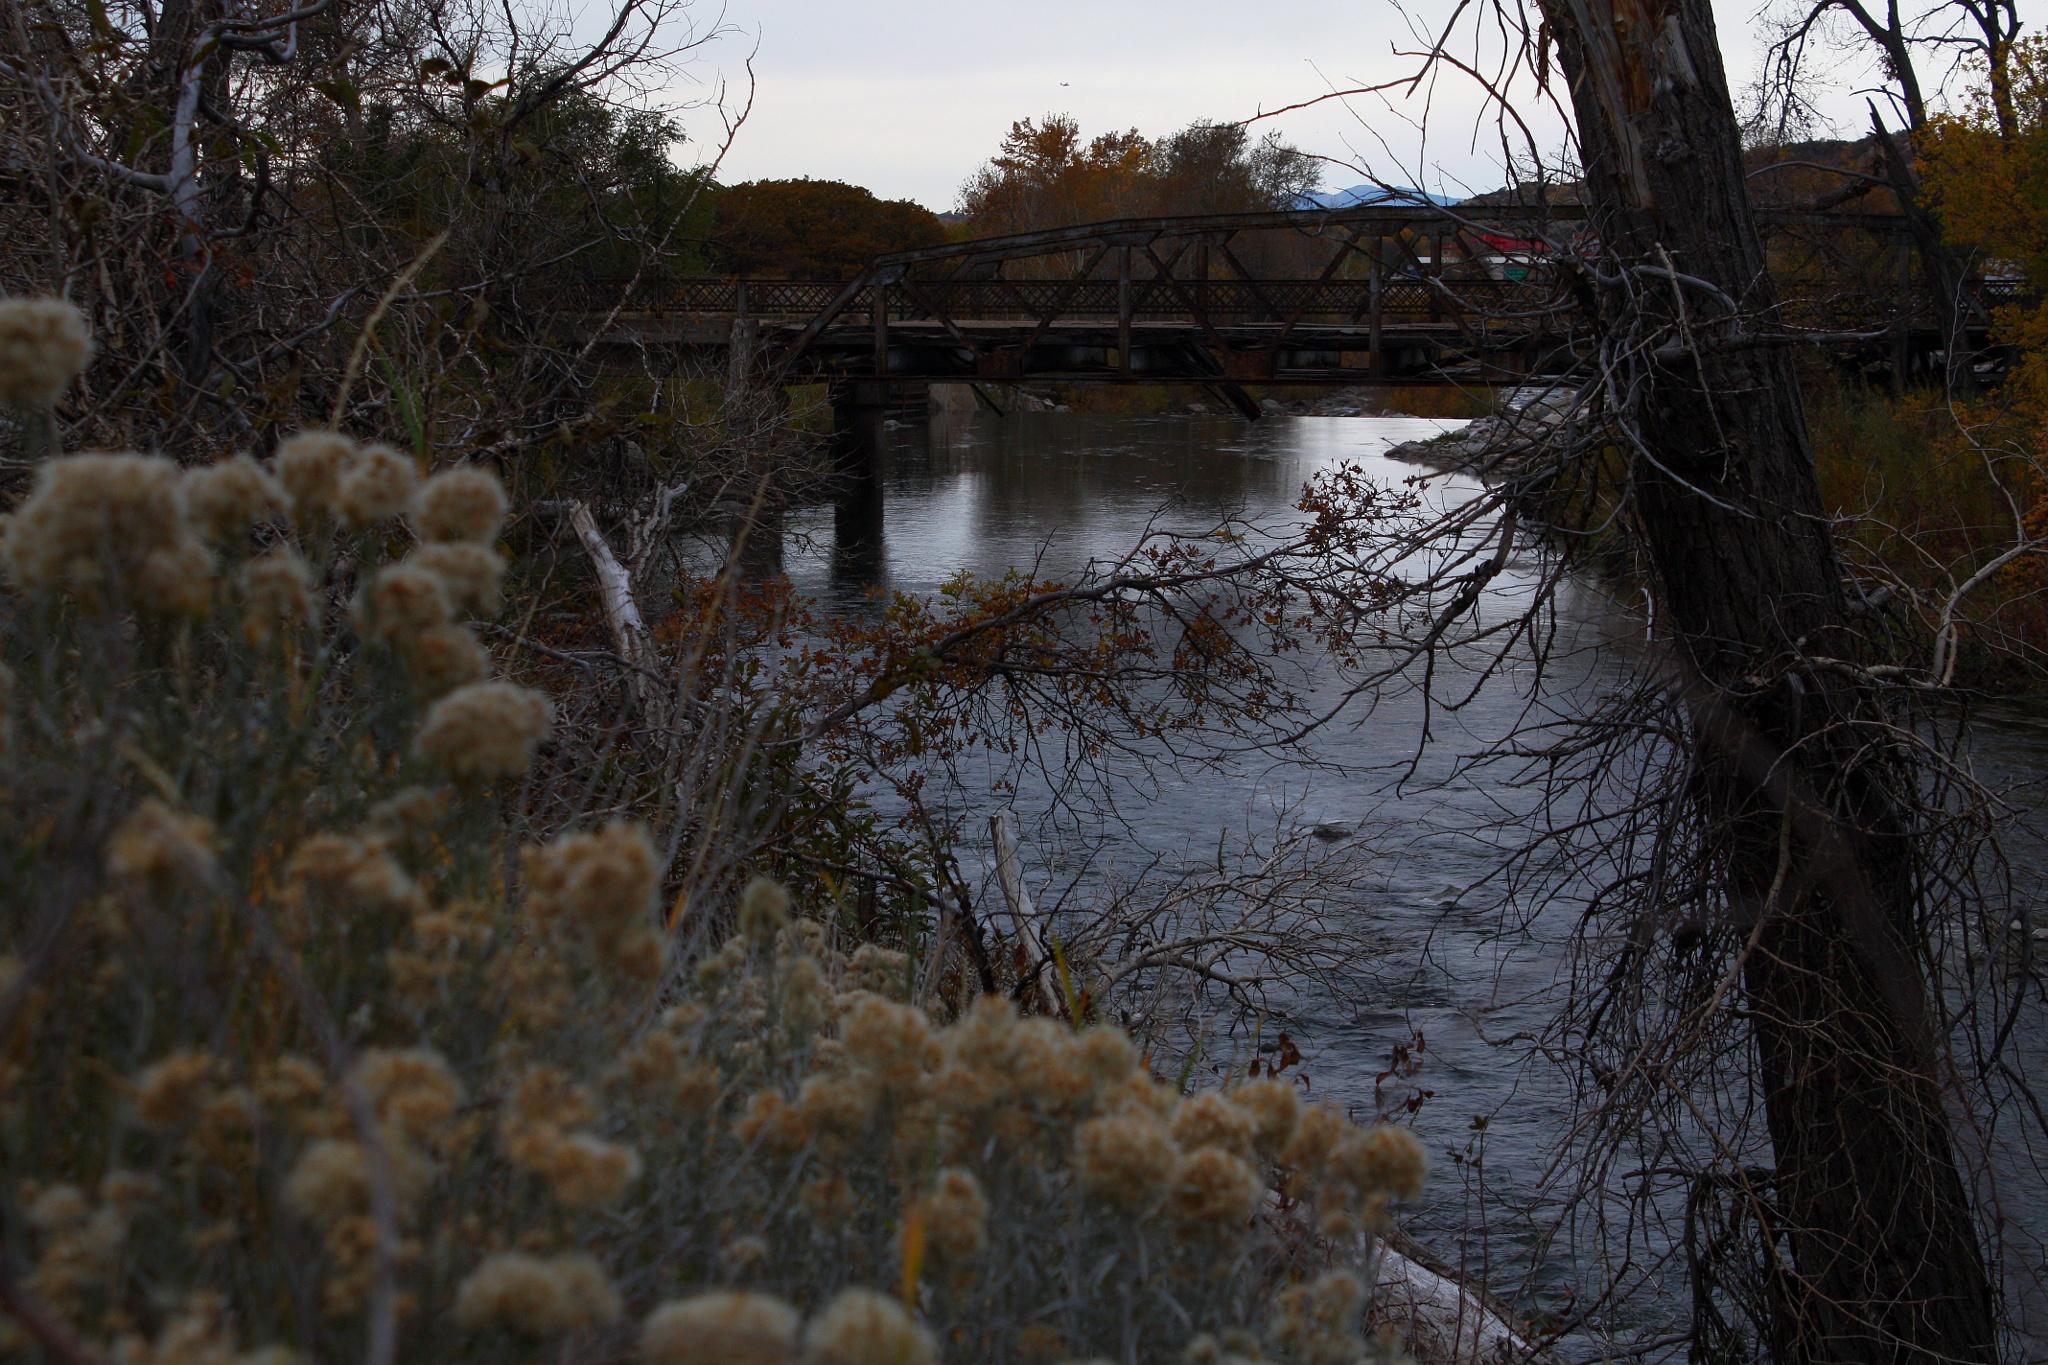 Bridge by Jim Beitz